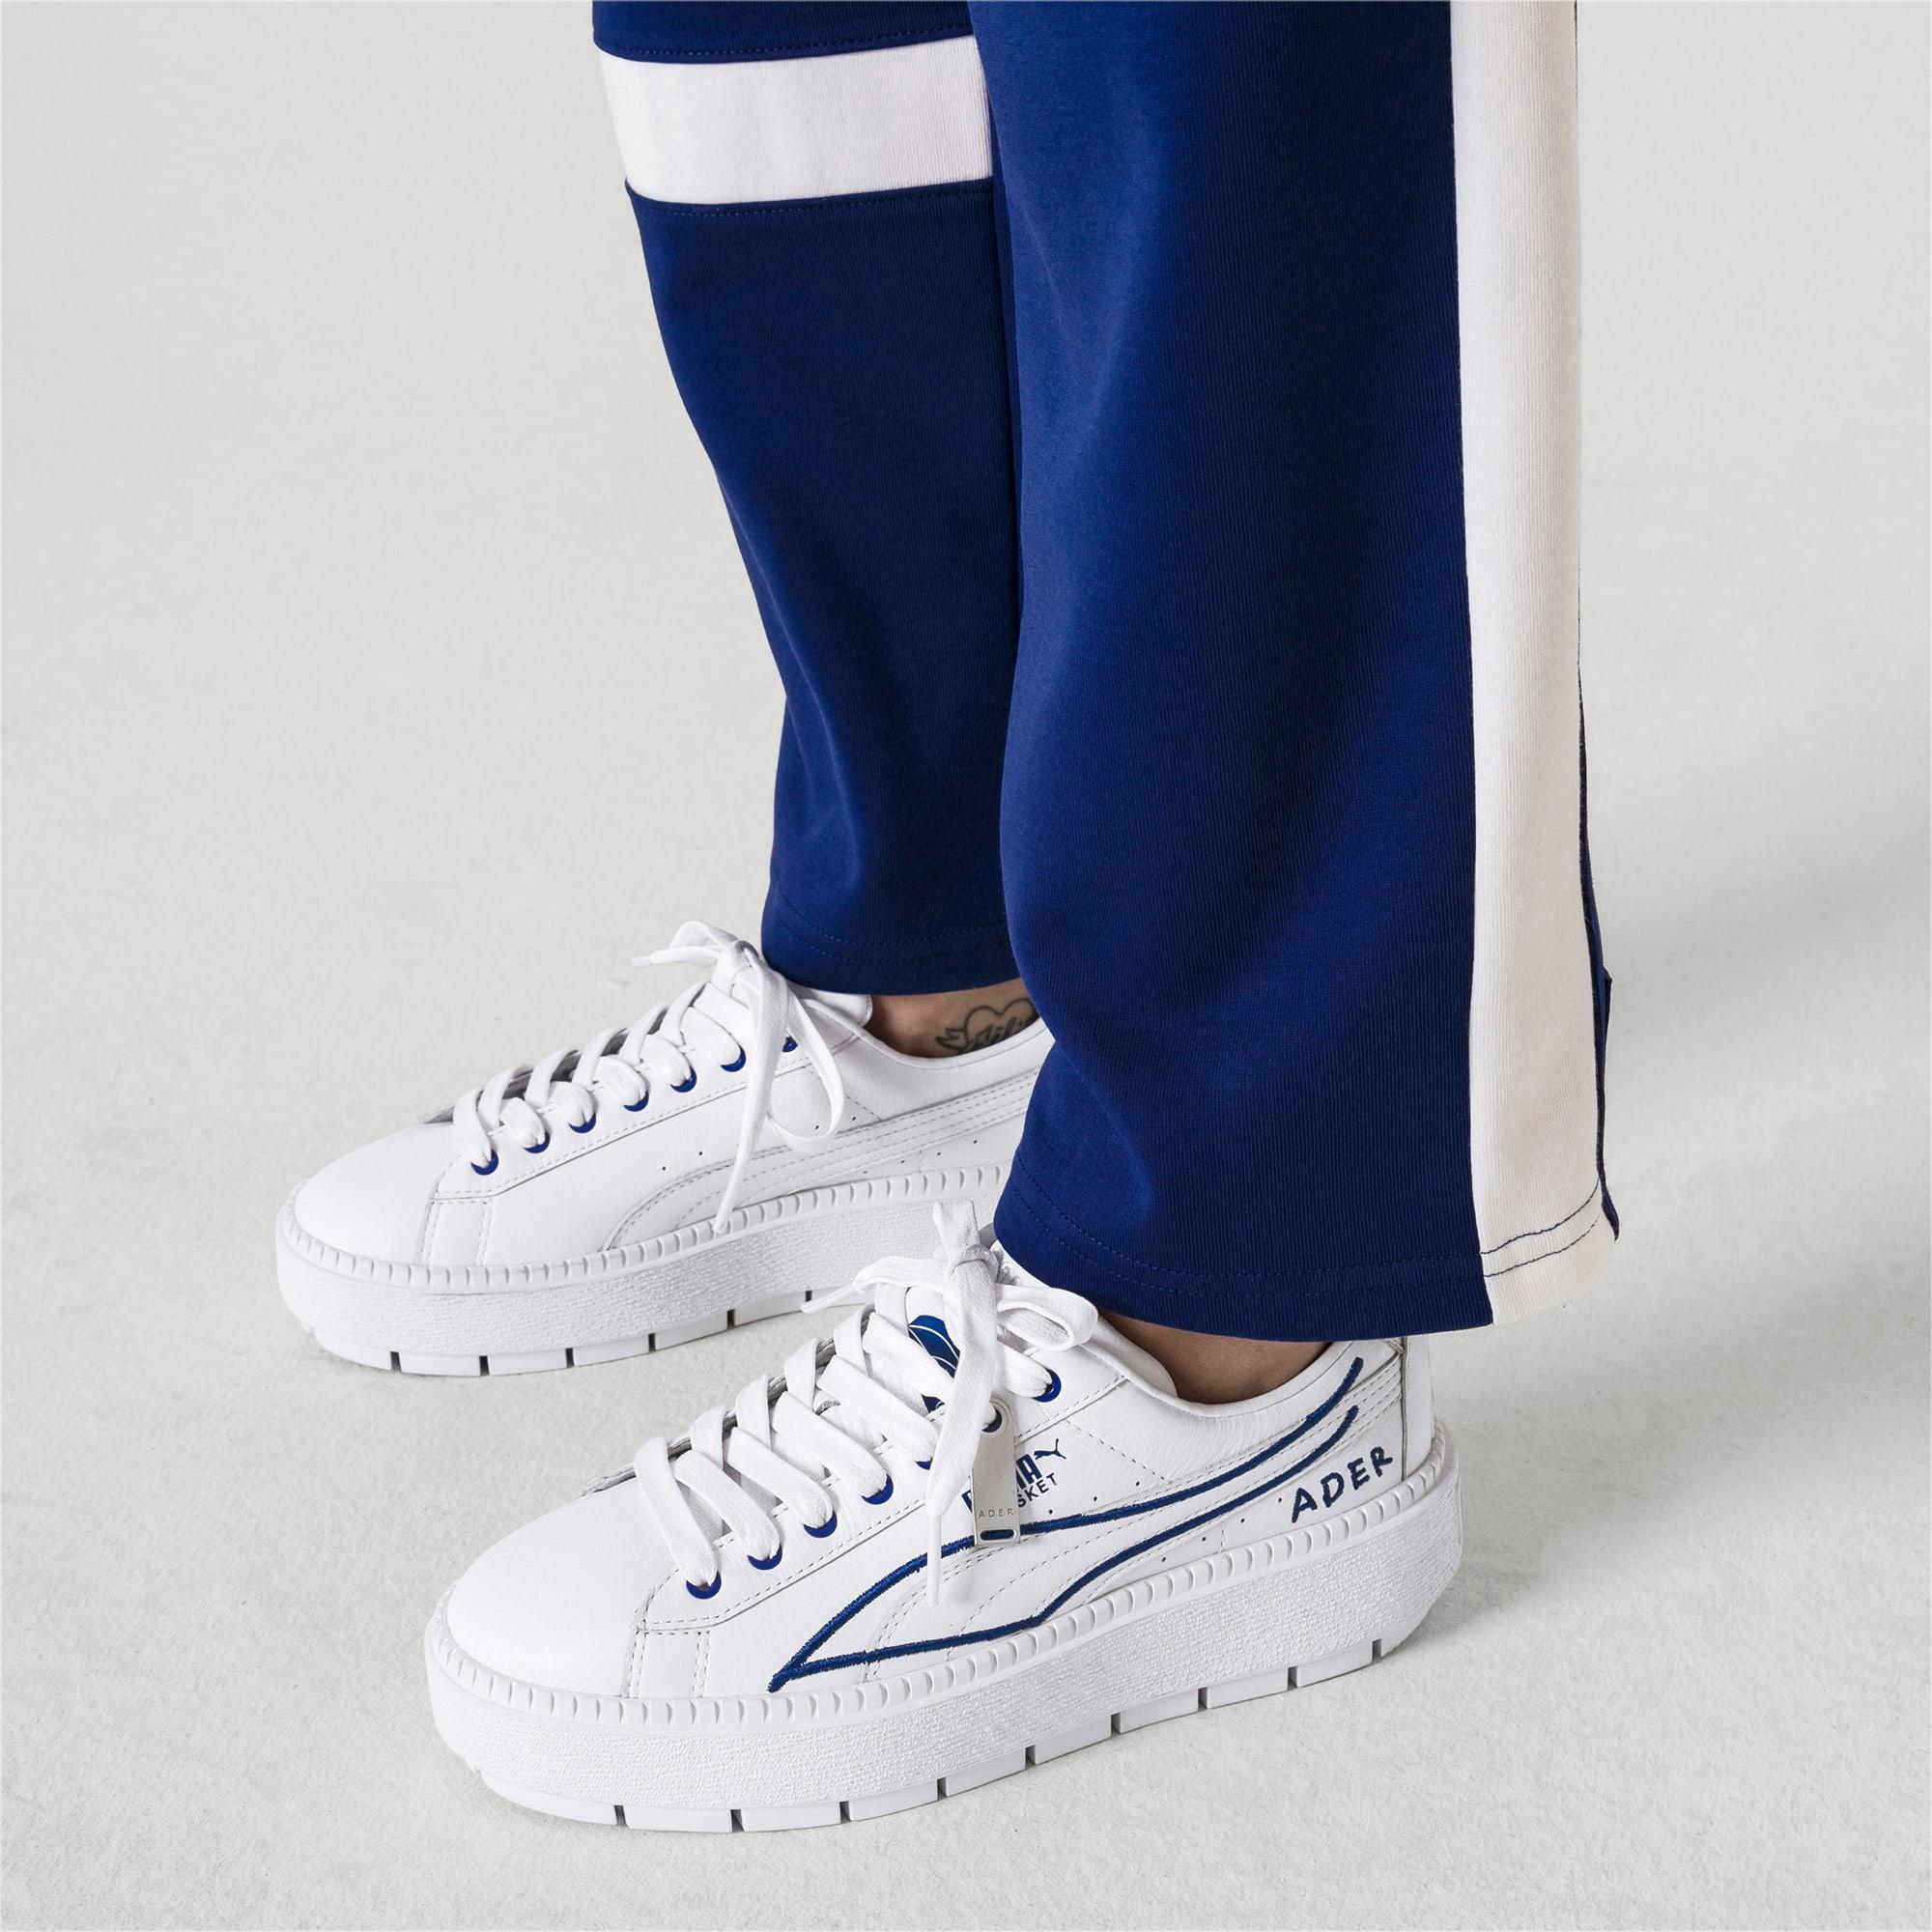 PUMA x ADER ERROR Platform Trace Women's Sneakers in 2019